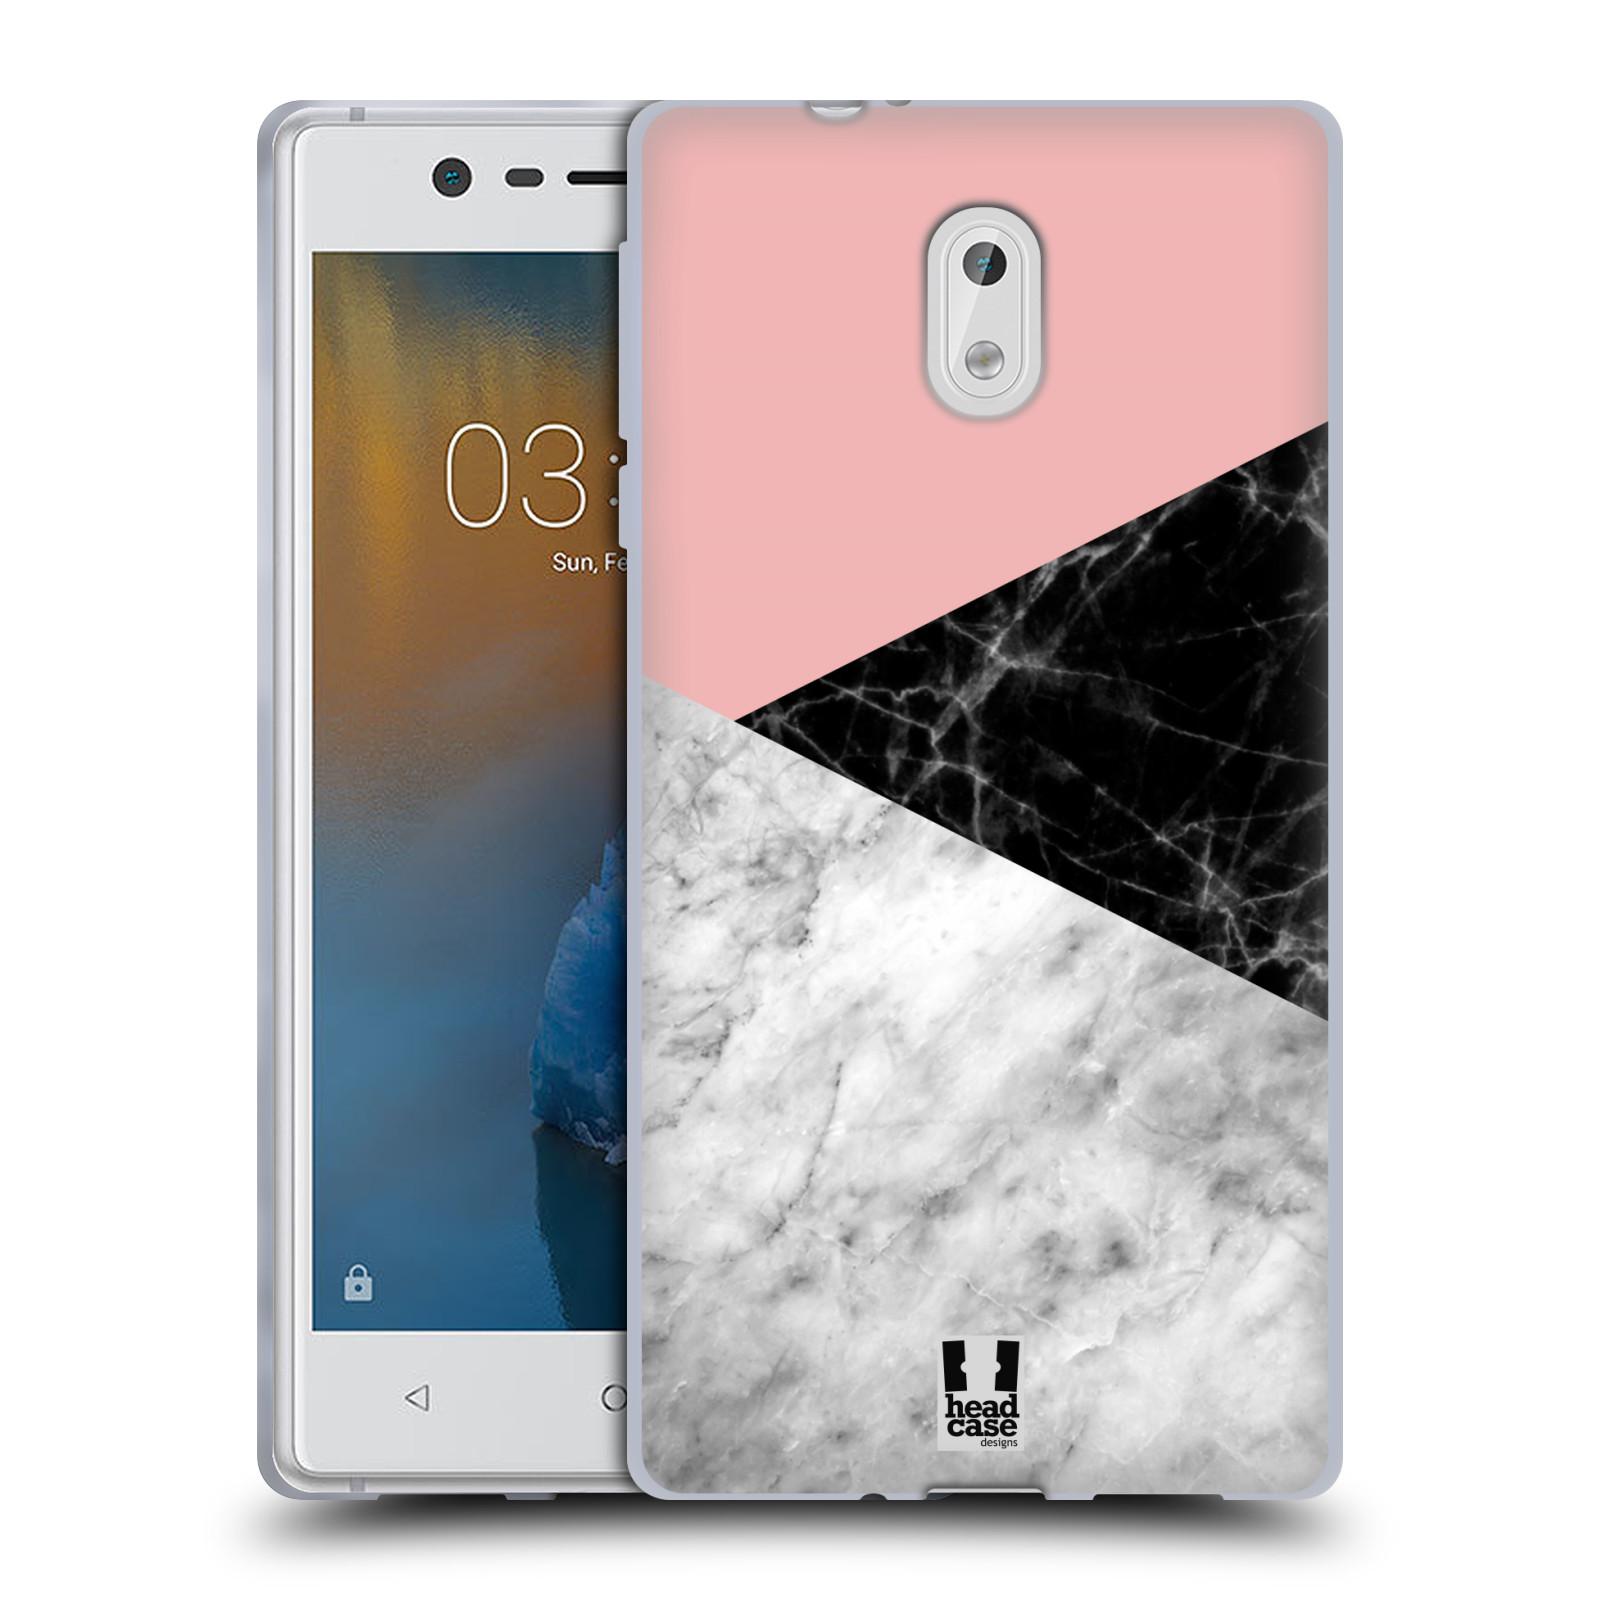 Silikonové pouzdro na mobil Nokia 3 Head Case - Mramor mix